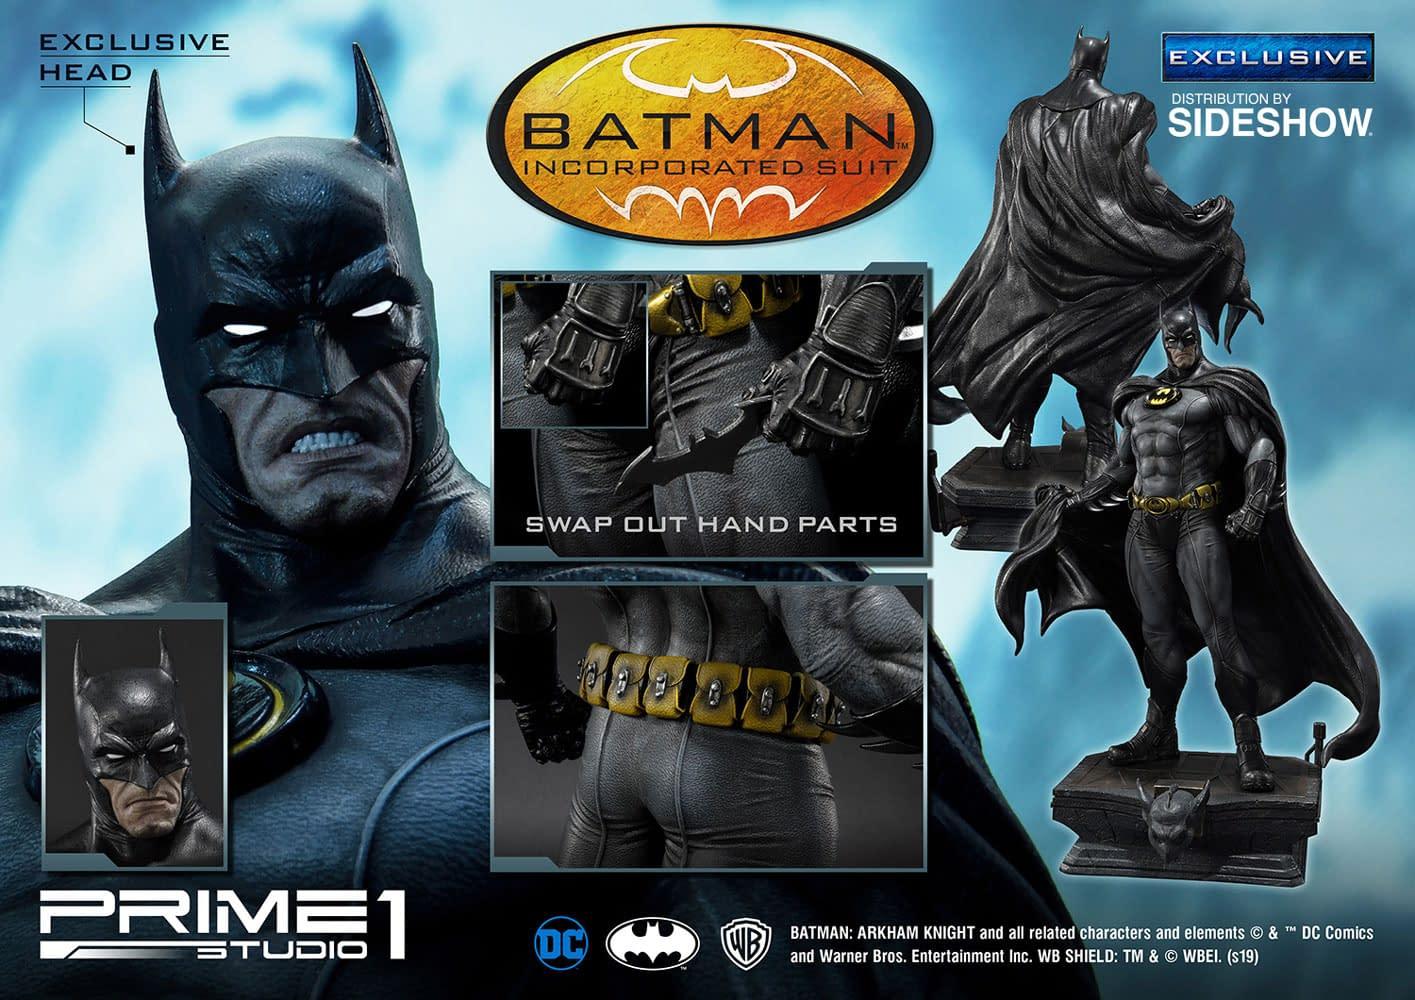 Batman Incorporated Prime 1 Studio Statue Goes to Sideshow